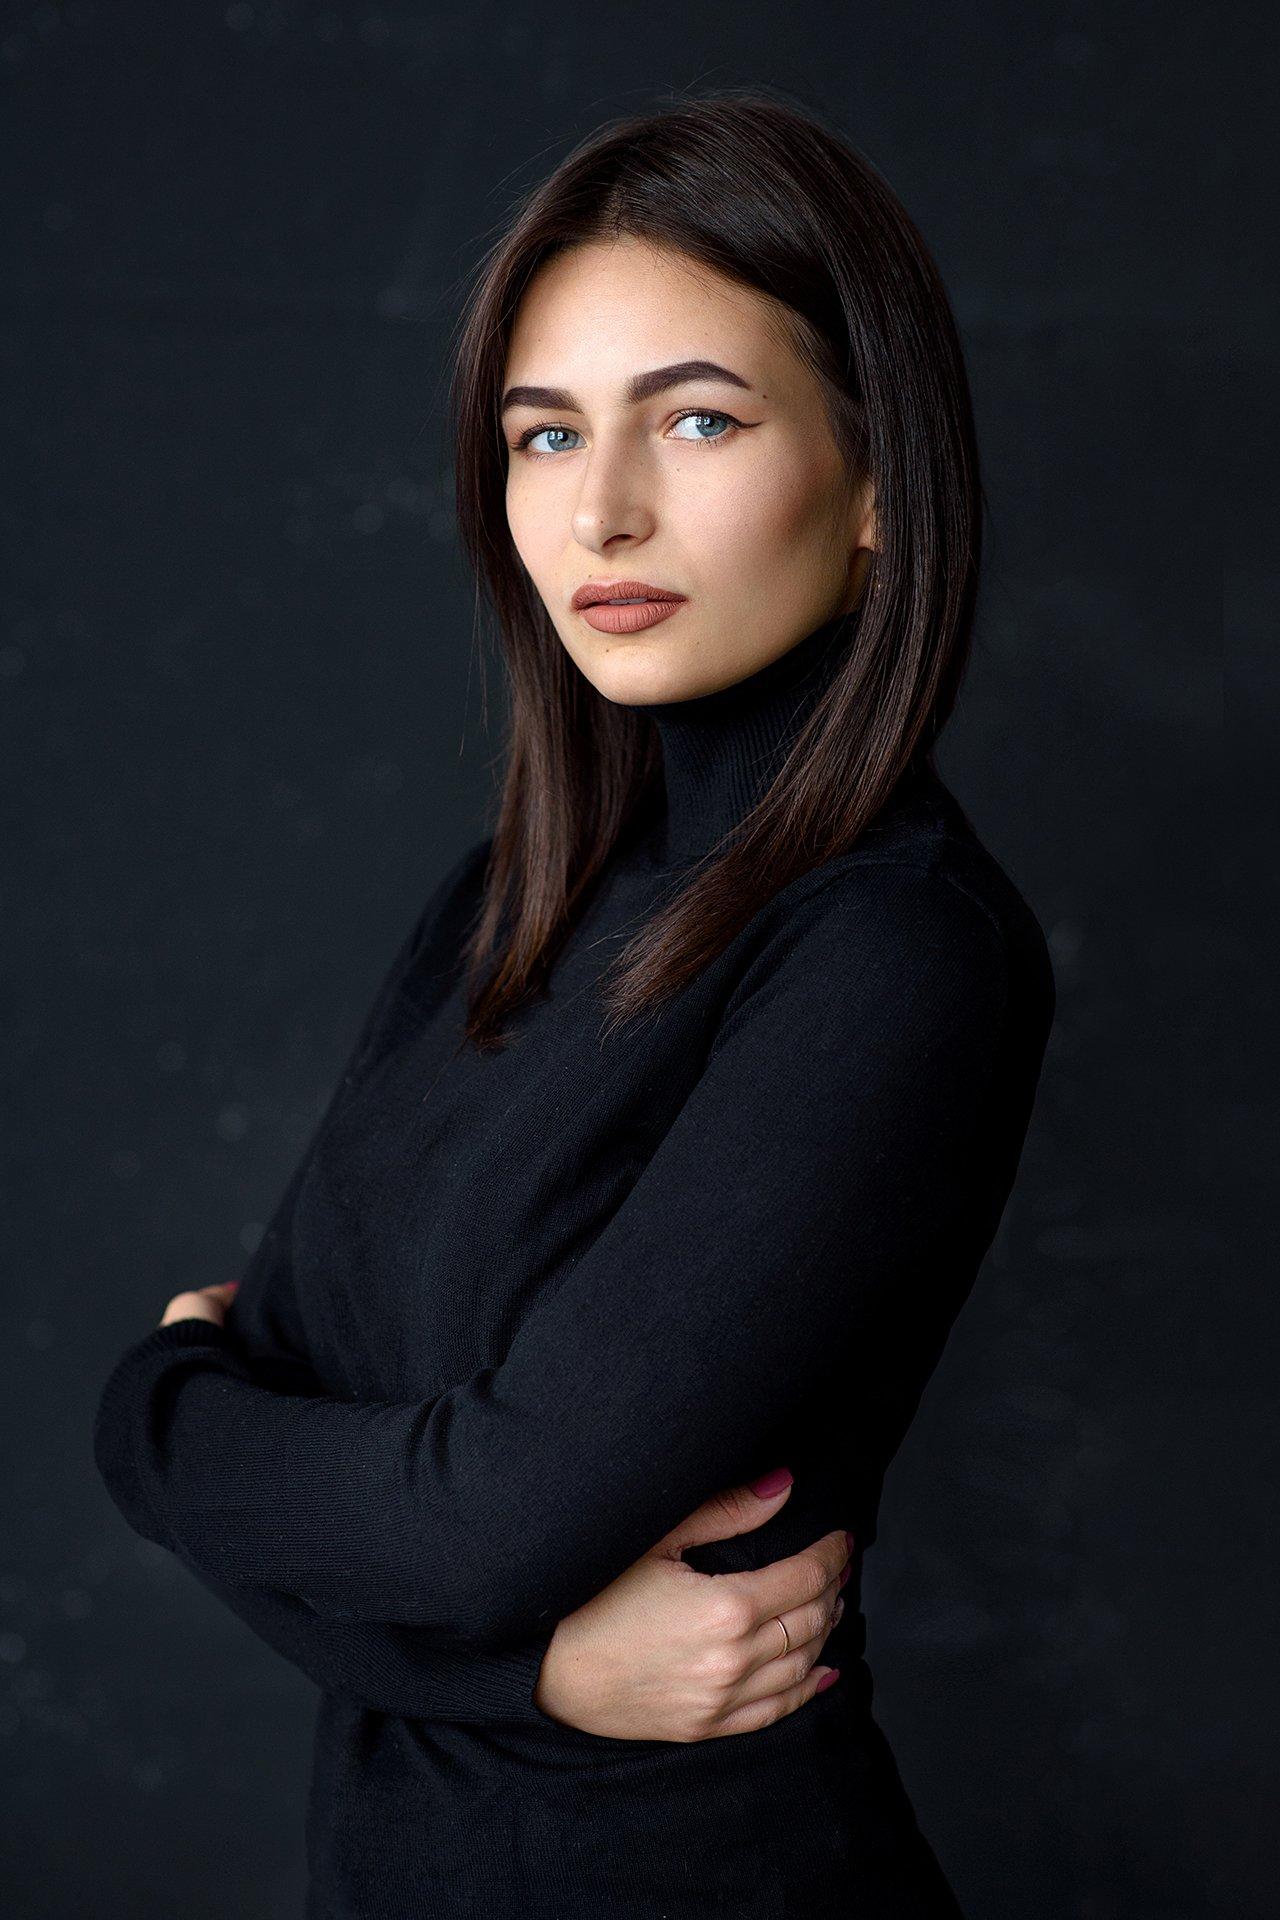 nikon, russia, 85mm, портрет, portrait, Александр Макушин